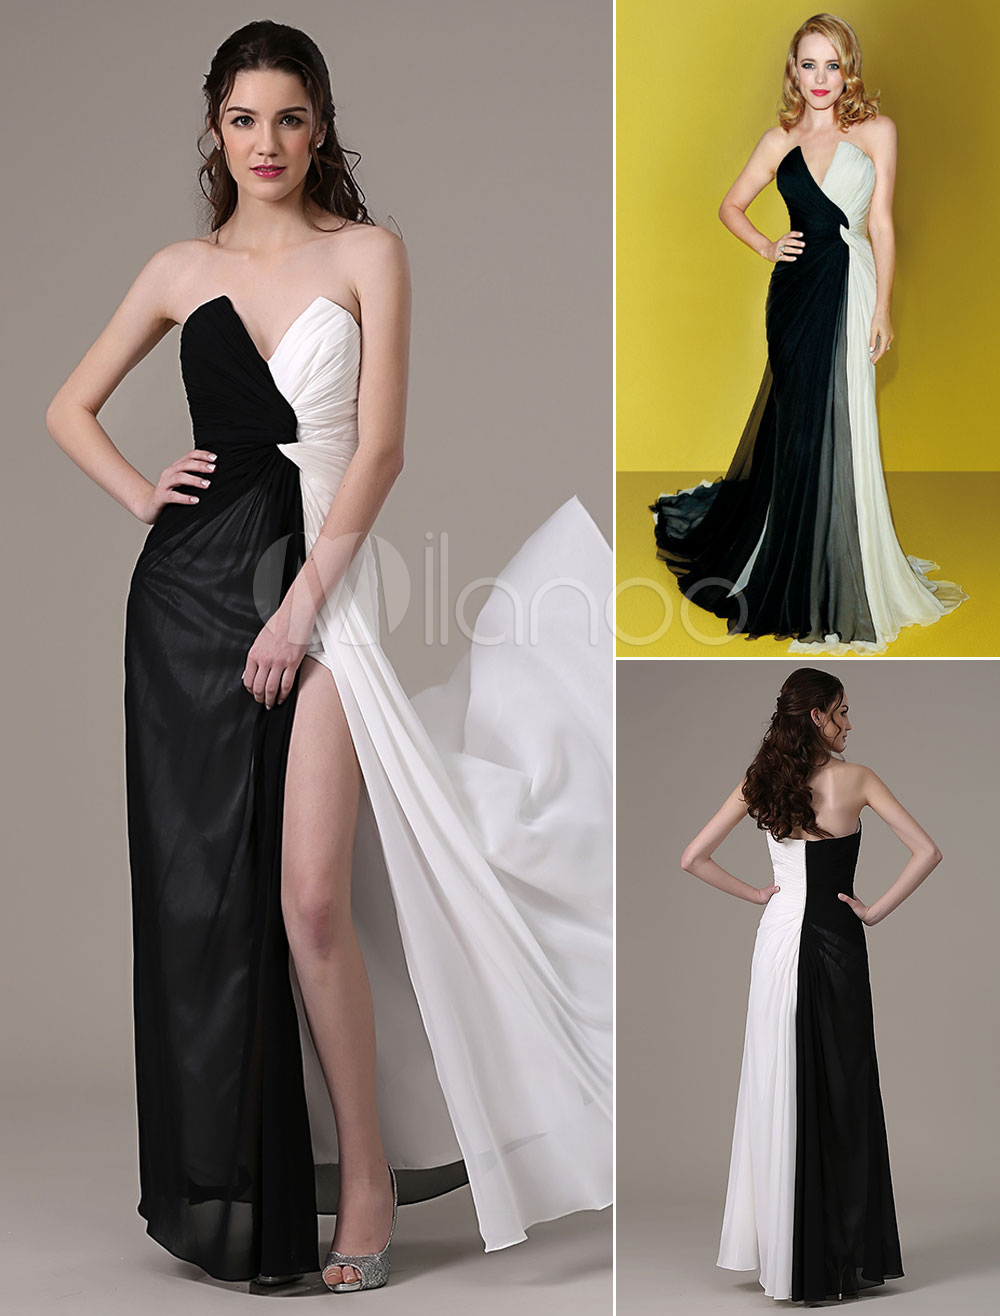 1e83b1f56421 Twisted Black and White V-Neck Strapless High Slit Chiffon Dress -  Milanoo.com